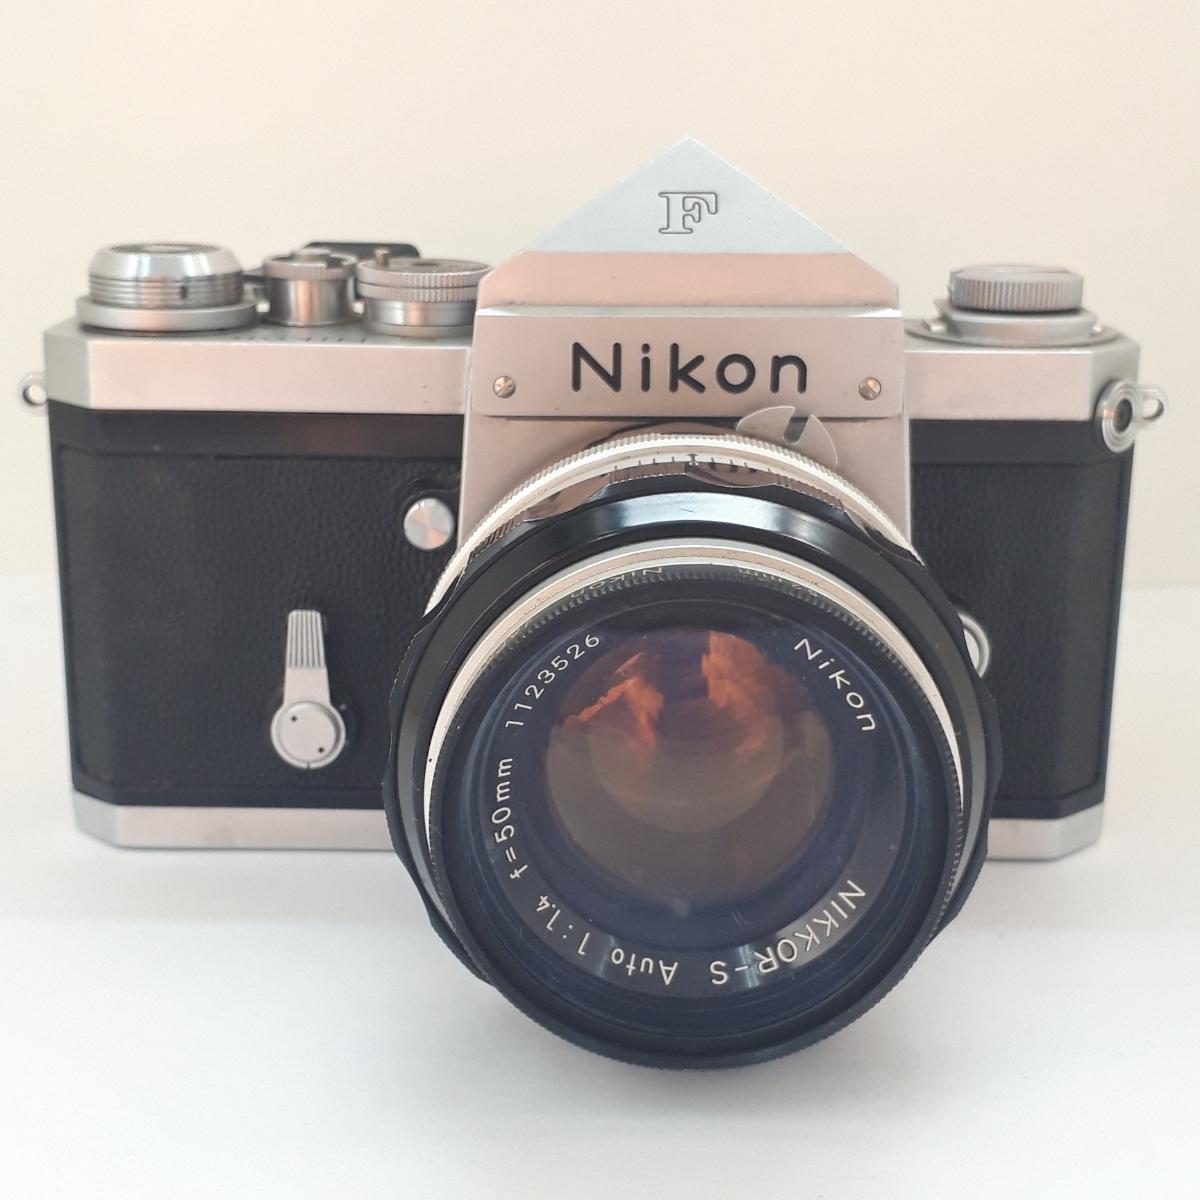 ★NIKON ニコン F NIKKOR-S 1:1.4 50mm 一眼レフカメラ レンズ★_画像2